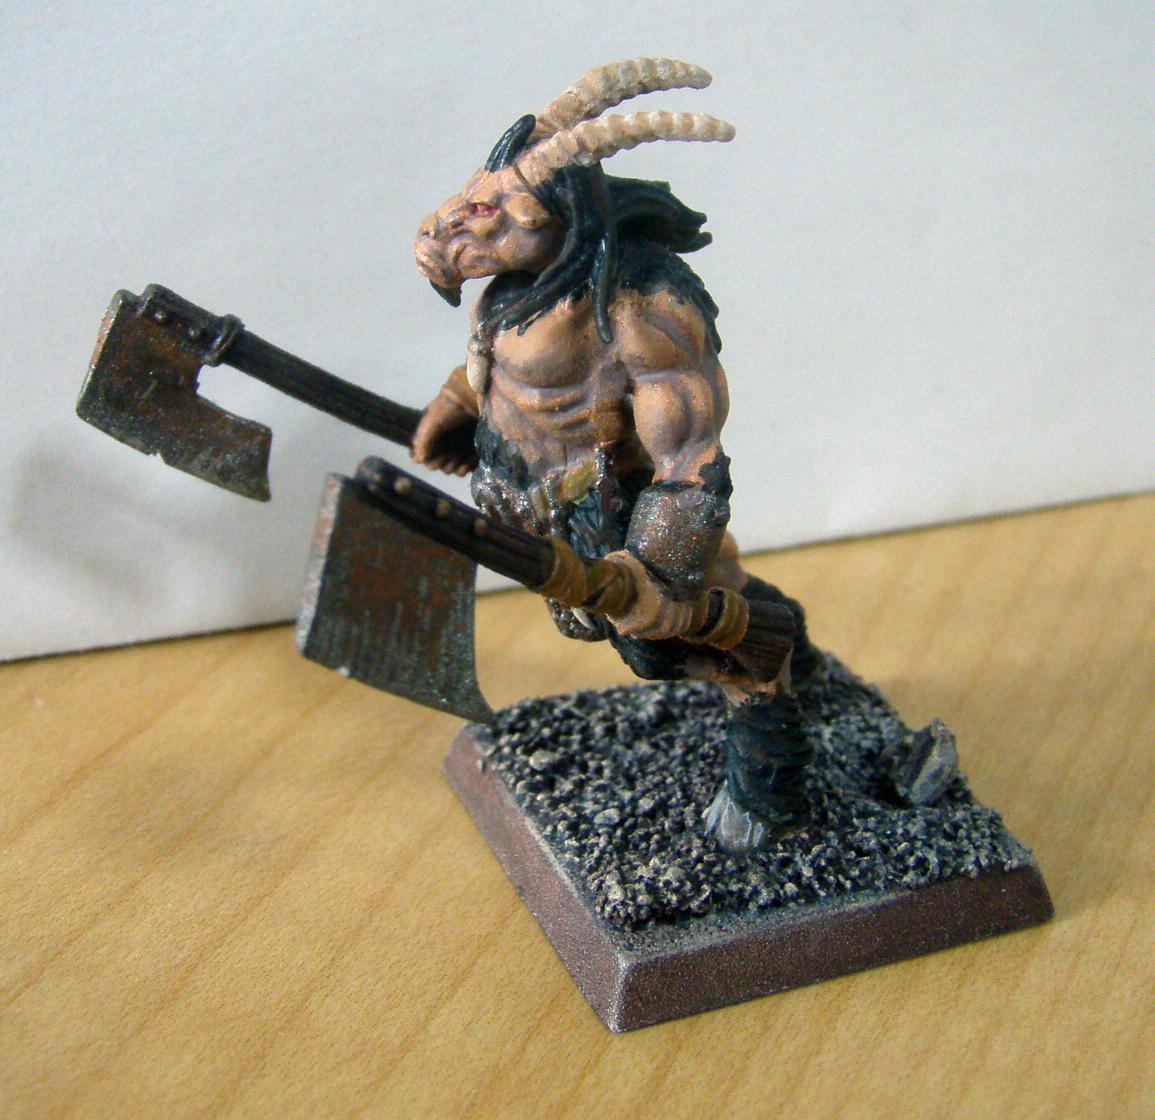 28mm, Beastmen, Beasts Of Chaos, Chaos, Games Workshop, Gor, Infantry, Warhammer Fantasy